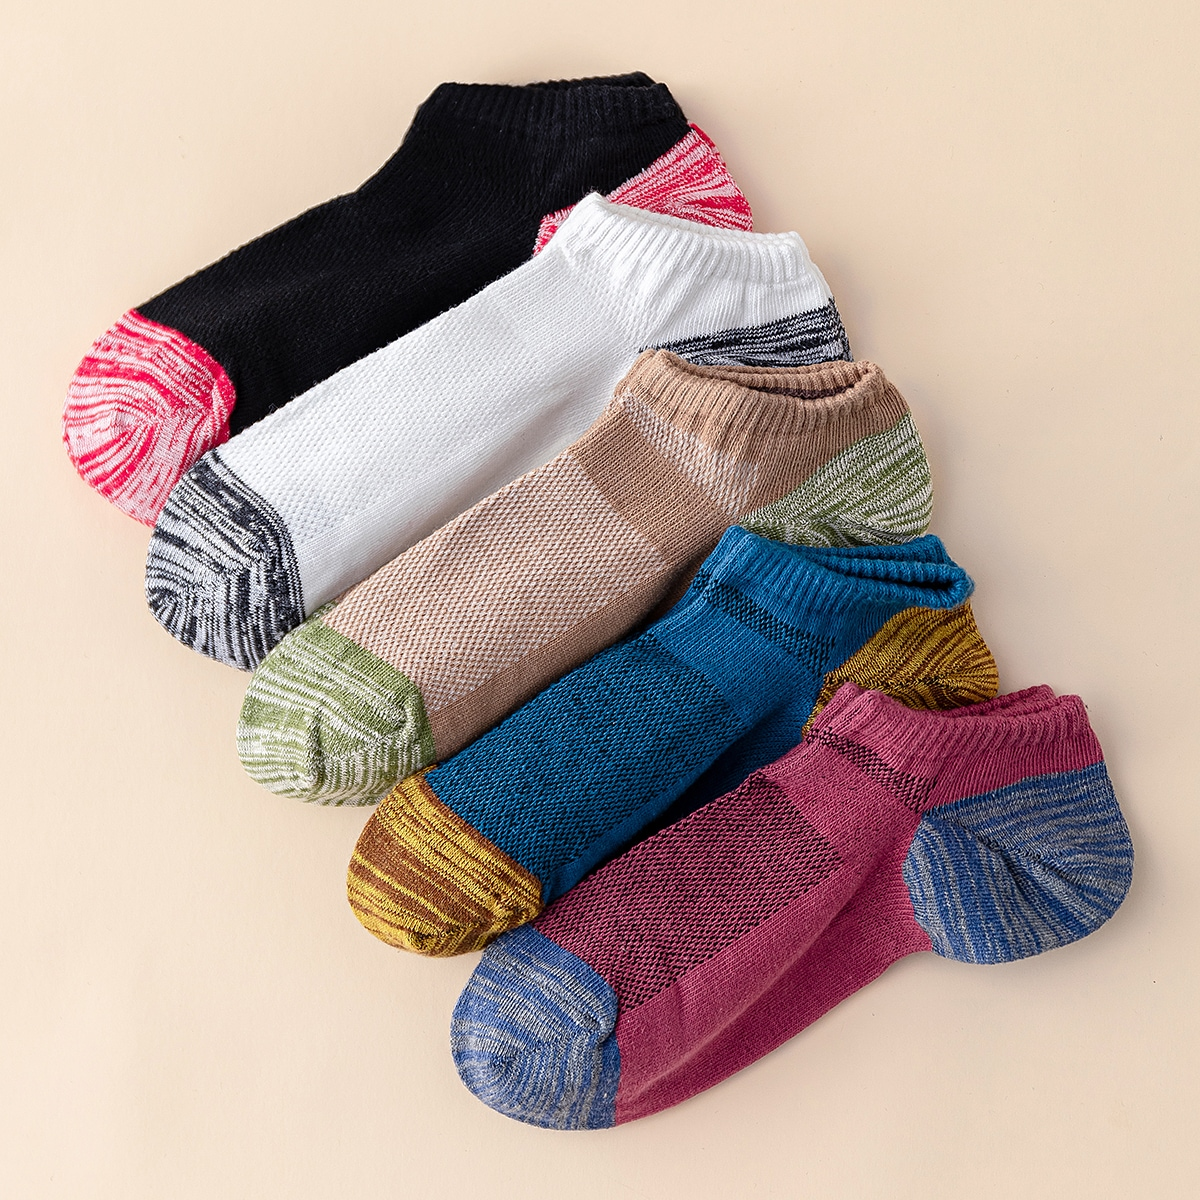 5pairs Colorblock Ankle Socks